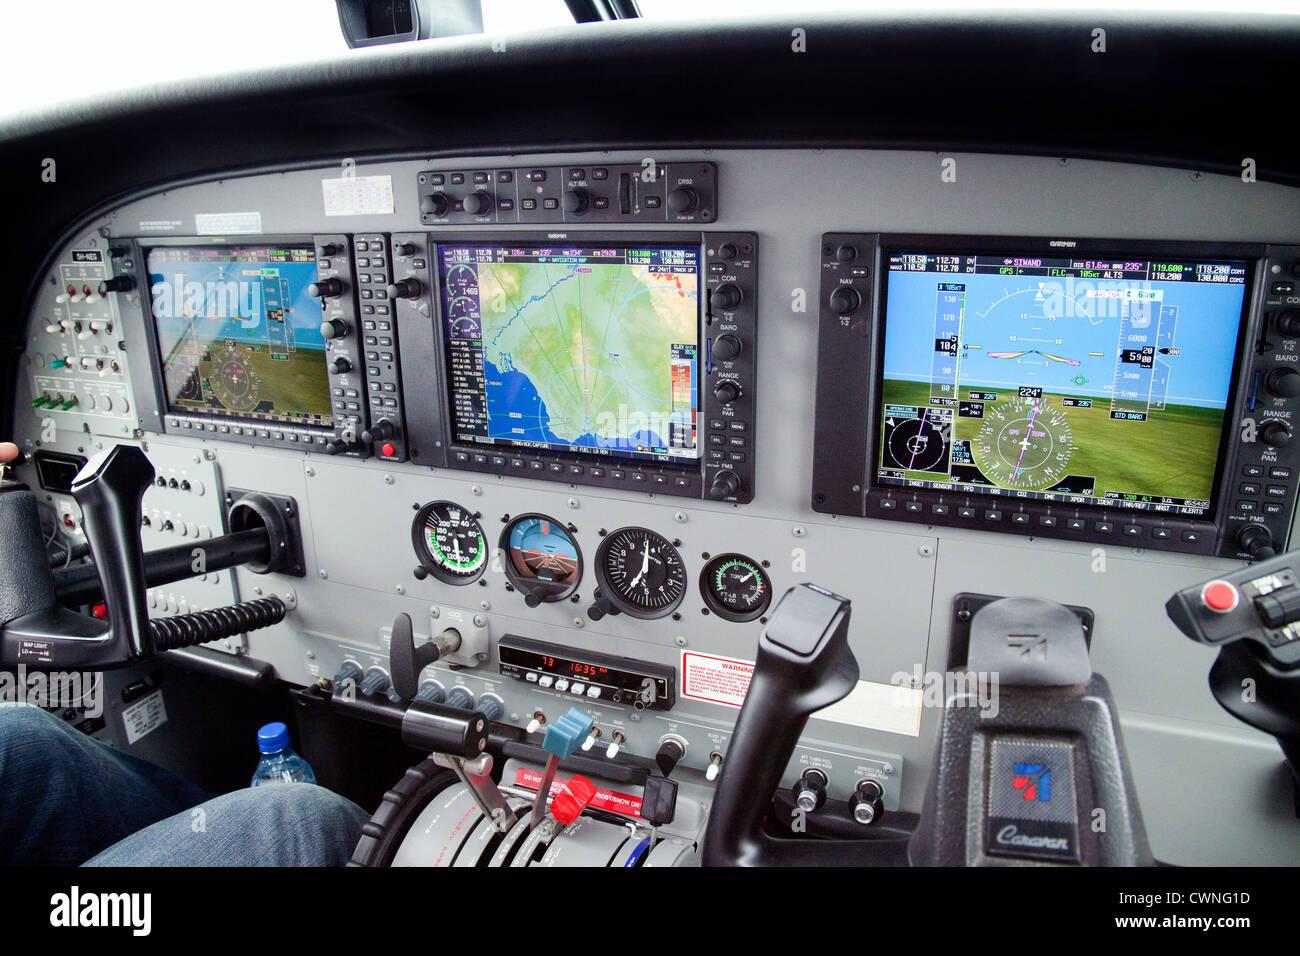 Cockpit of a modern Cessna Caravan light aircraft - Stock Image